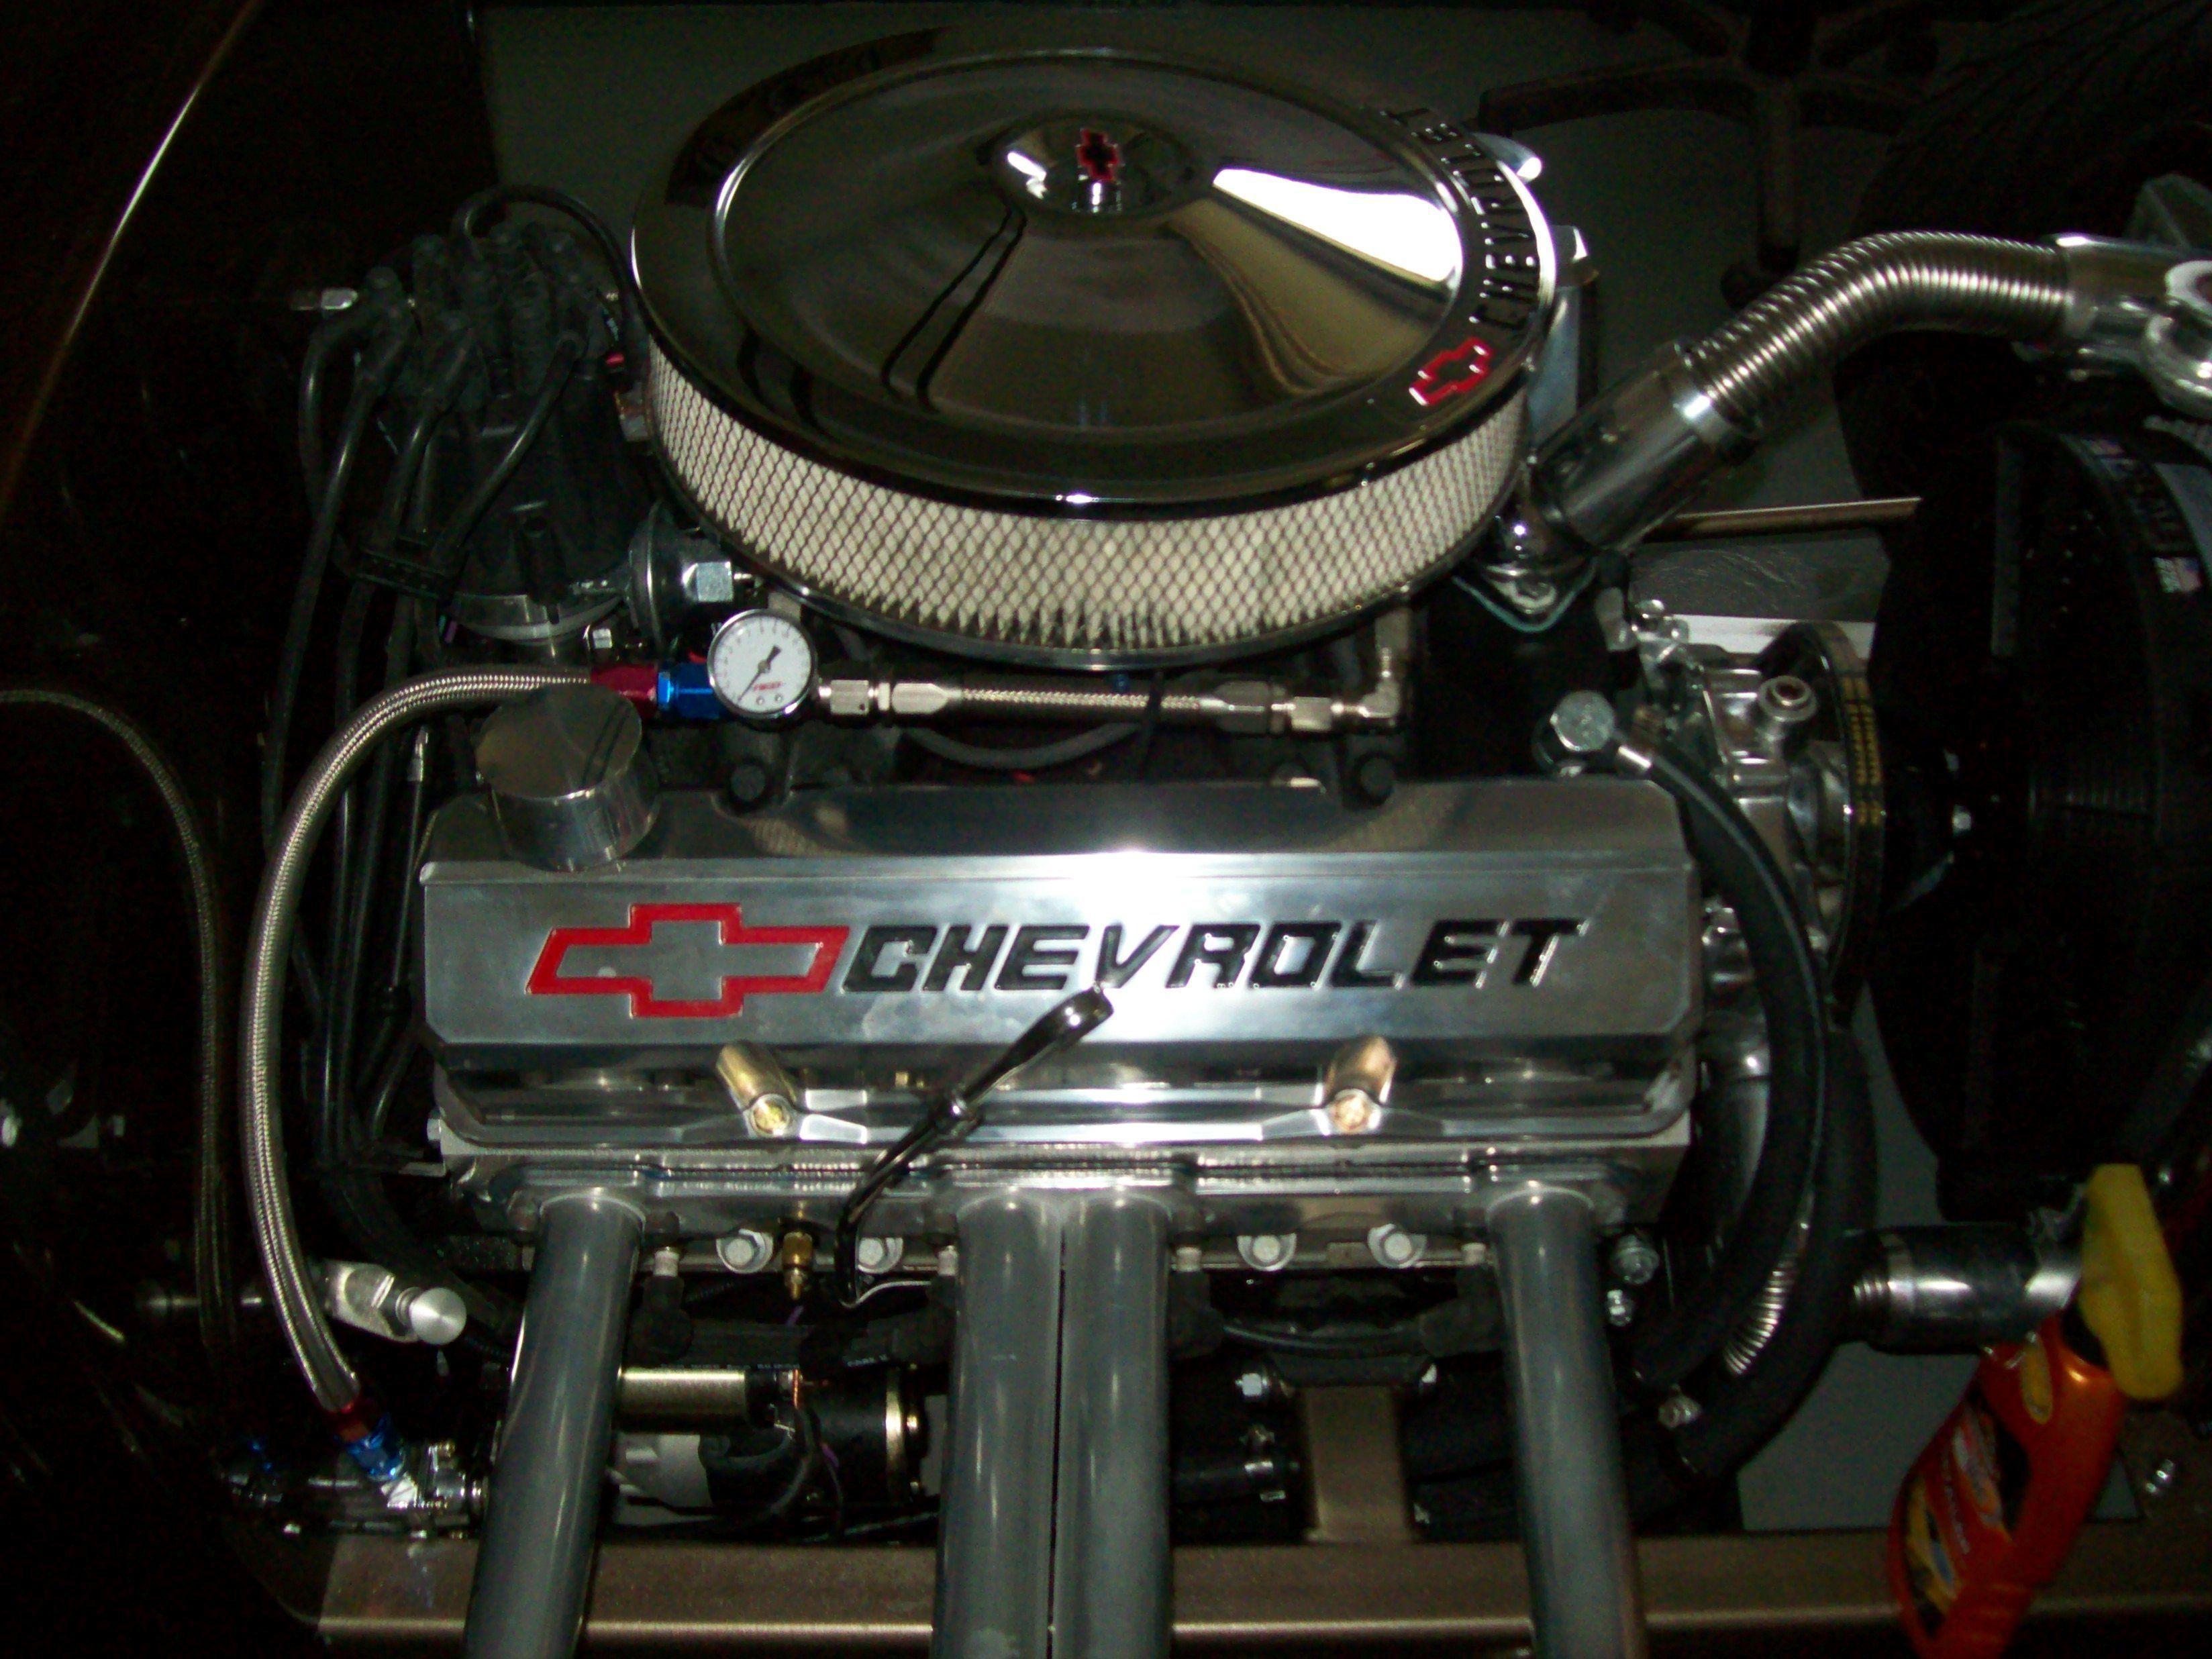 383ci stroker crate engine small block gm style longblock engine malvernweather Images